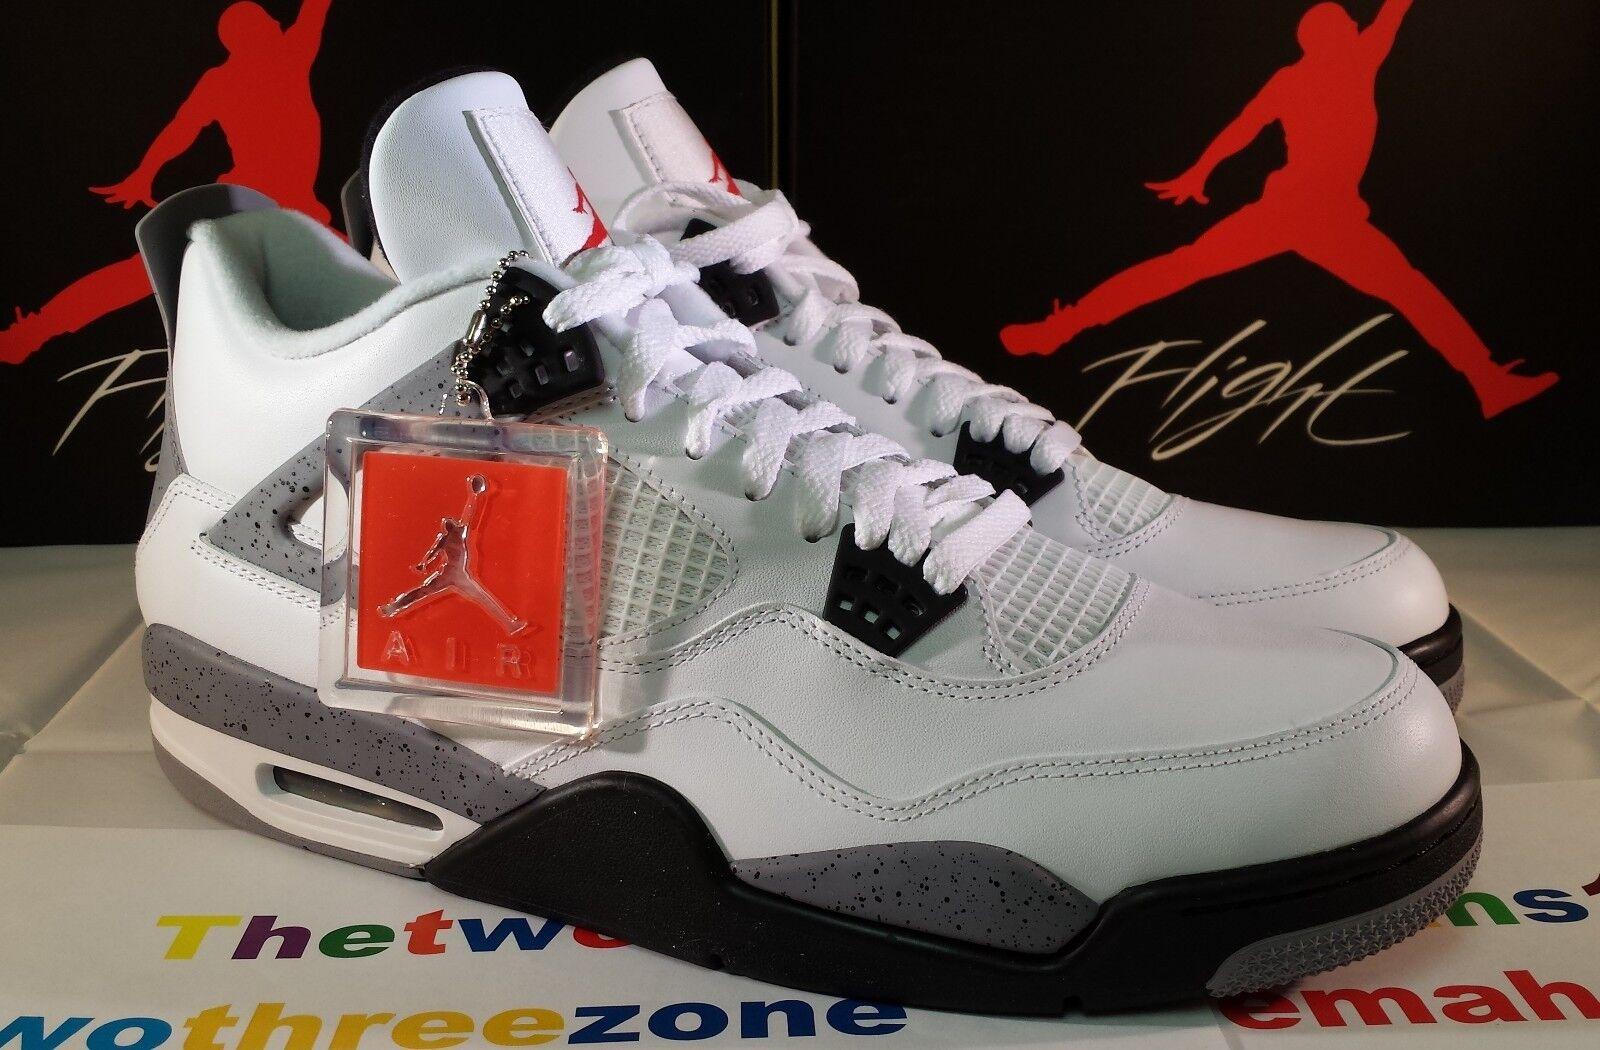 Nike air jordan 4 retro bianco 12 / cemento grigio sz 12 bianco iv xi vii vi, viii, x - eminem 0ff72f